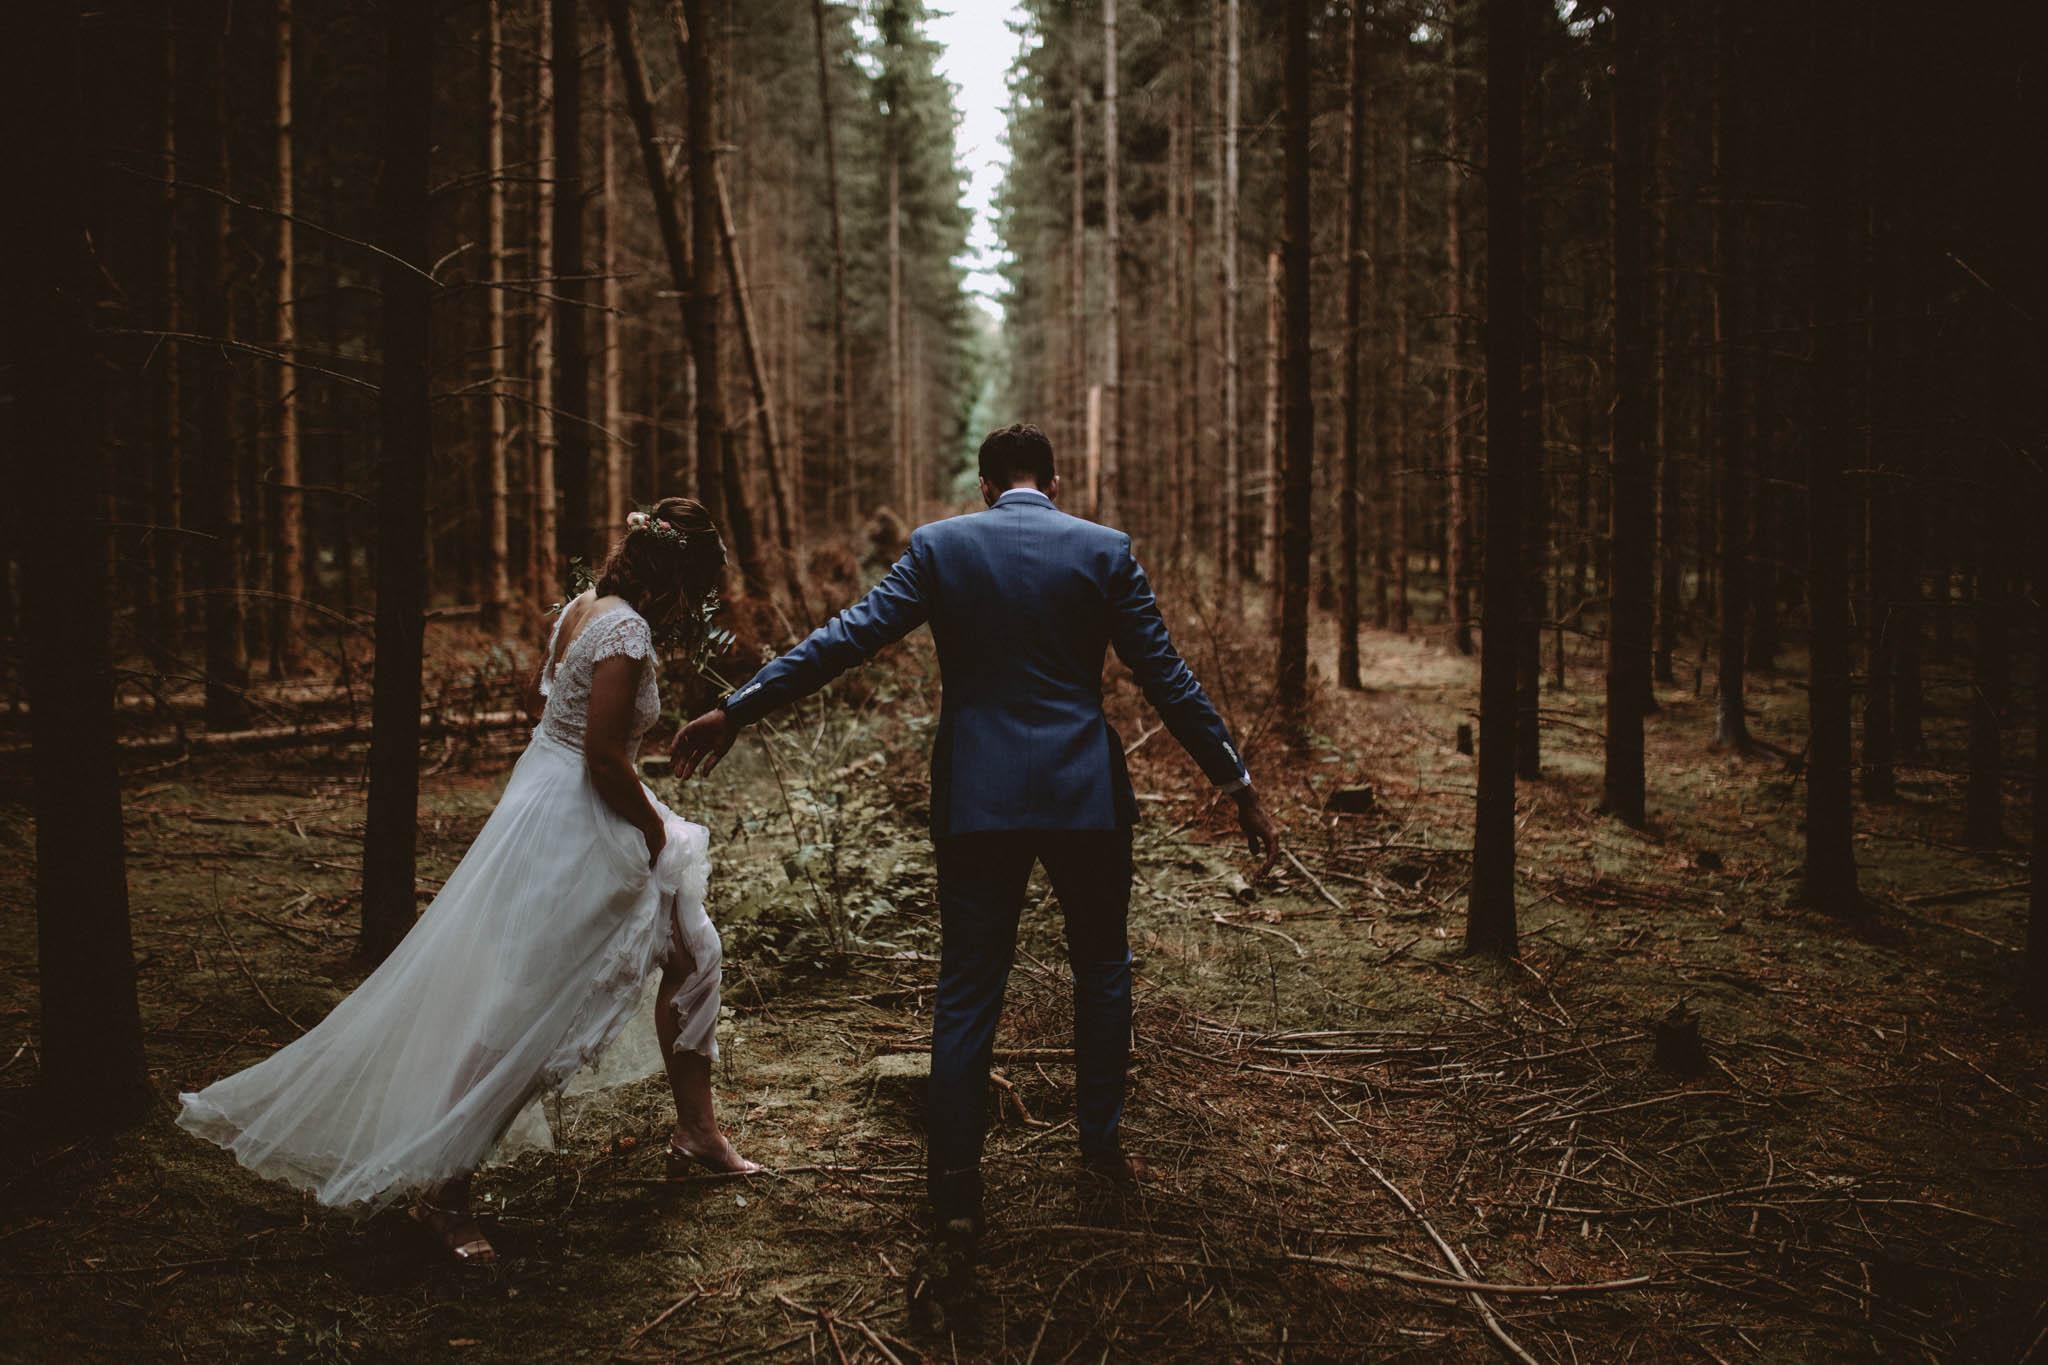 Brautpaarshoot in Schmetterlingsgarten, Jakobshagen, Brandenburg